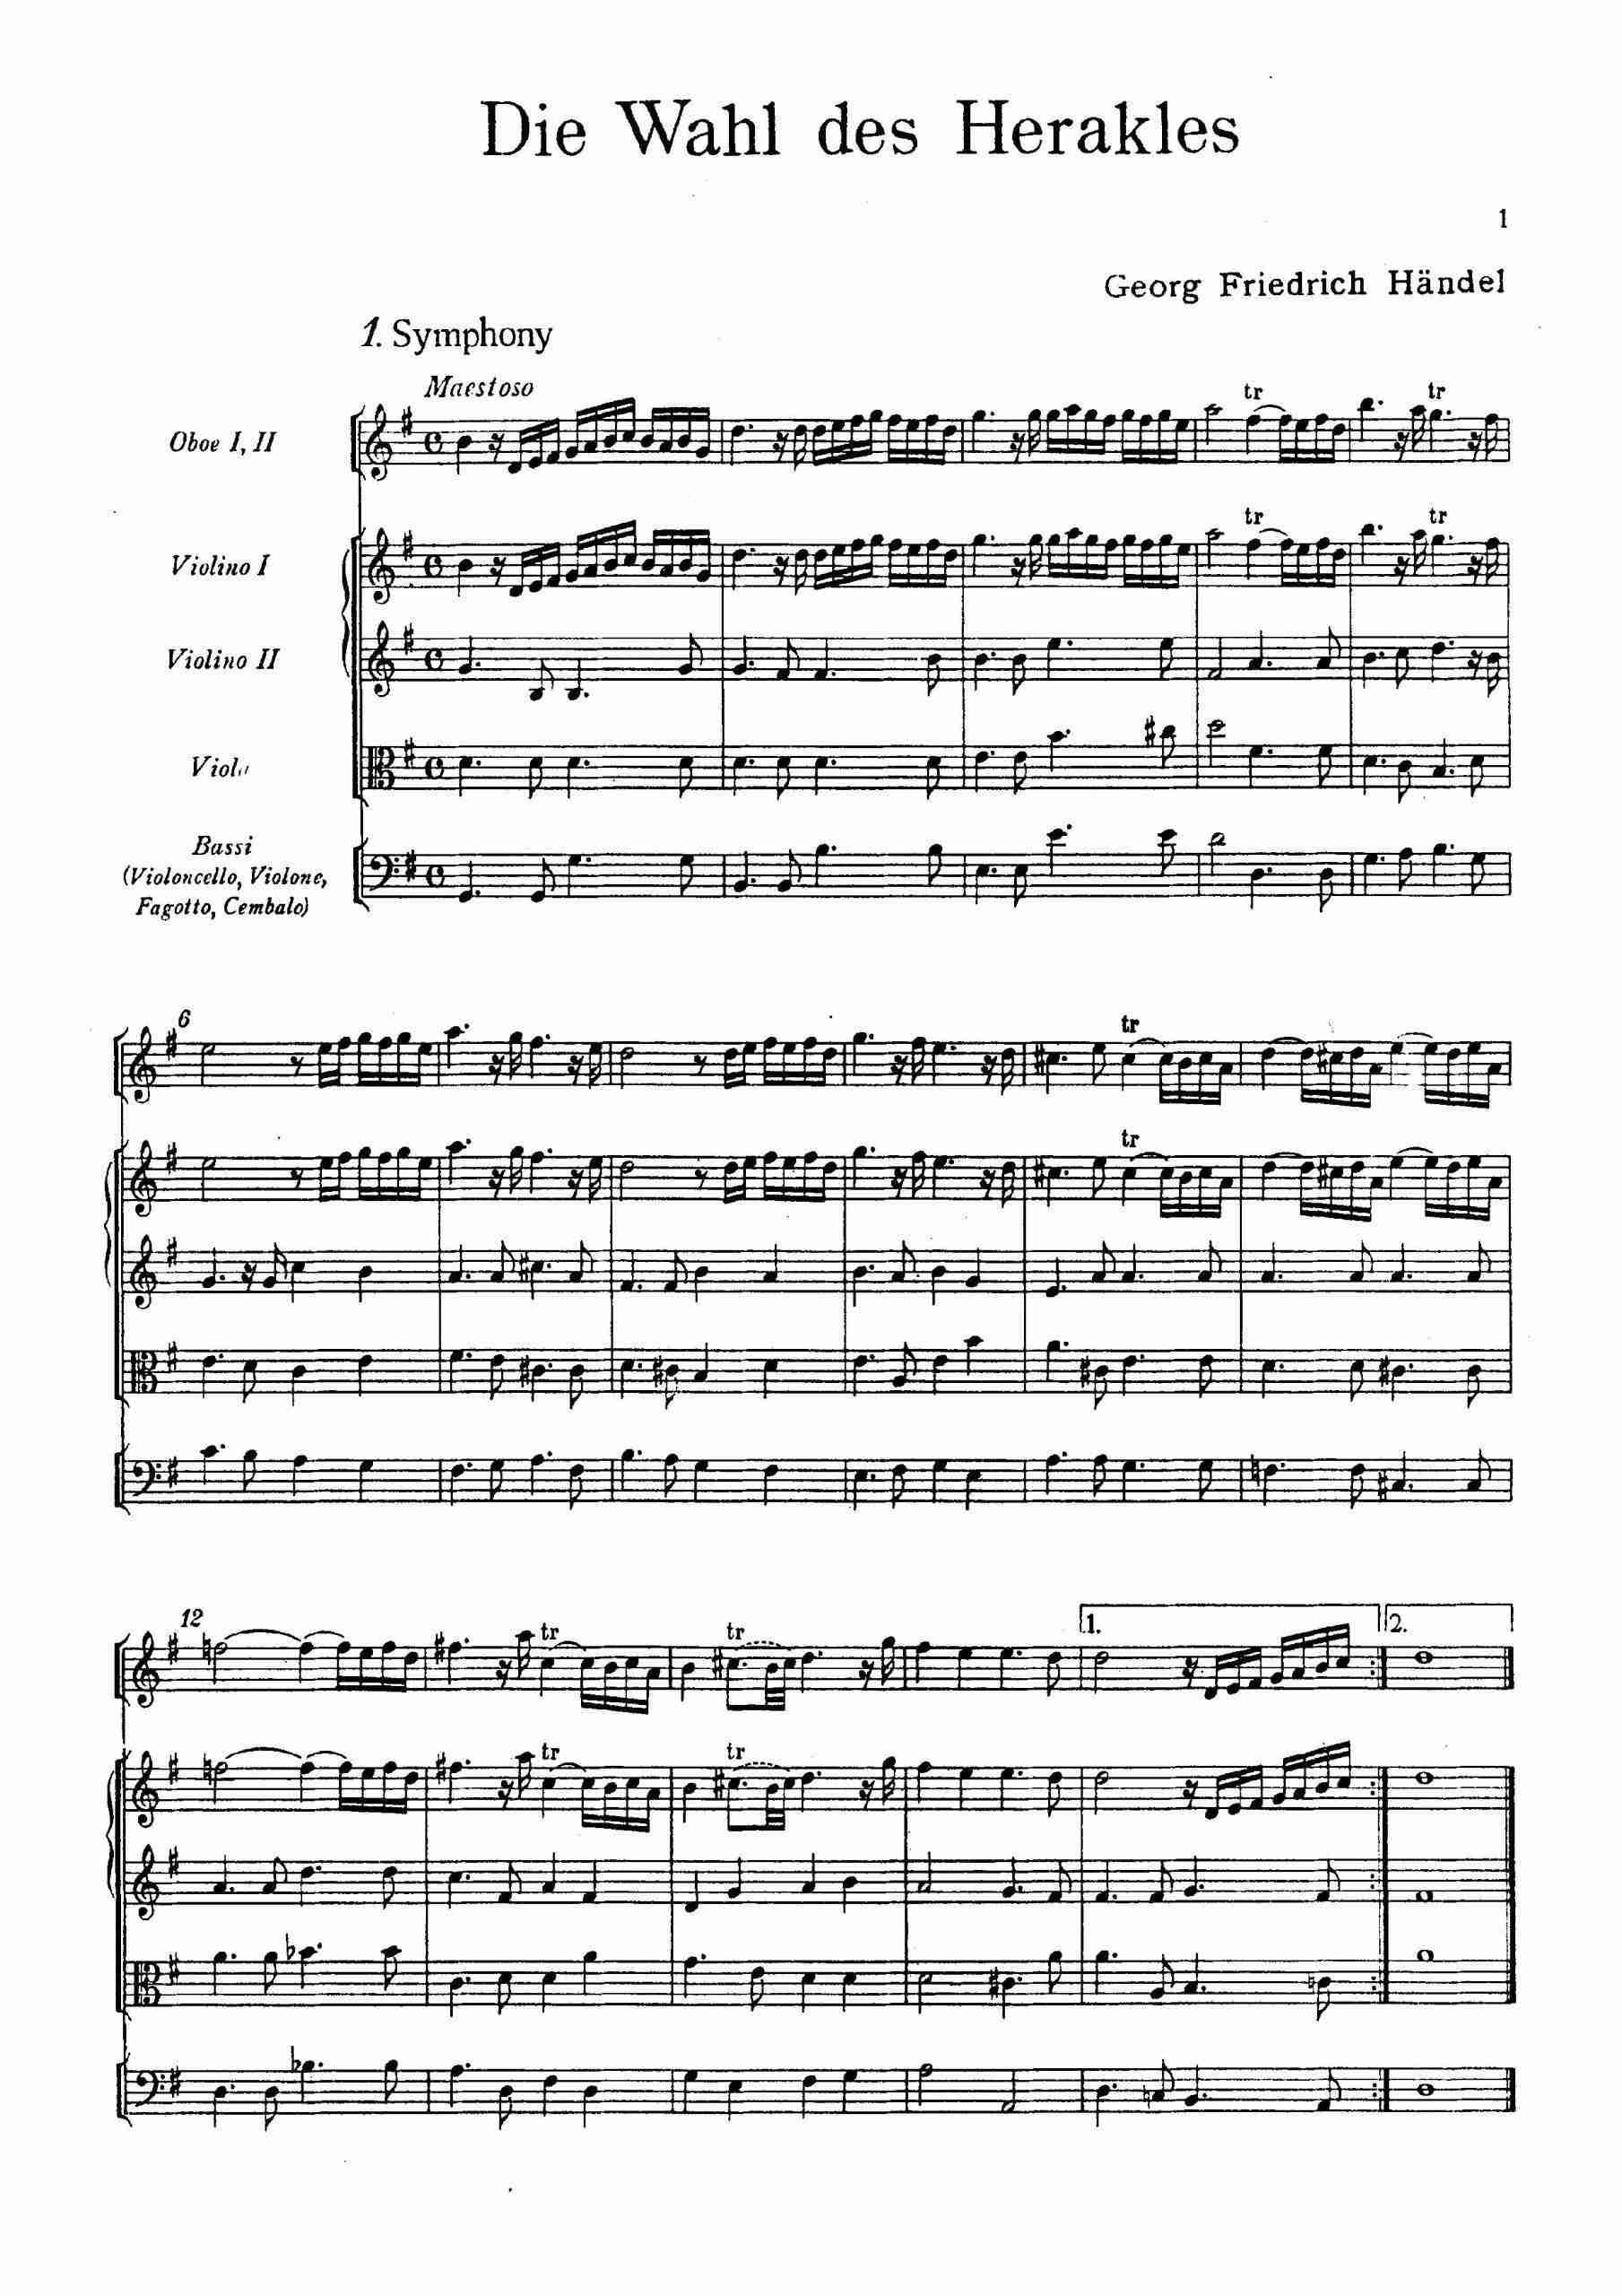 Handel, George Frideric - The Choice of Hercules, HWV 69 - score